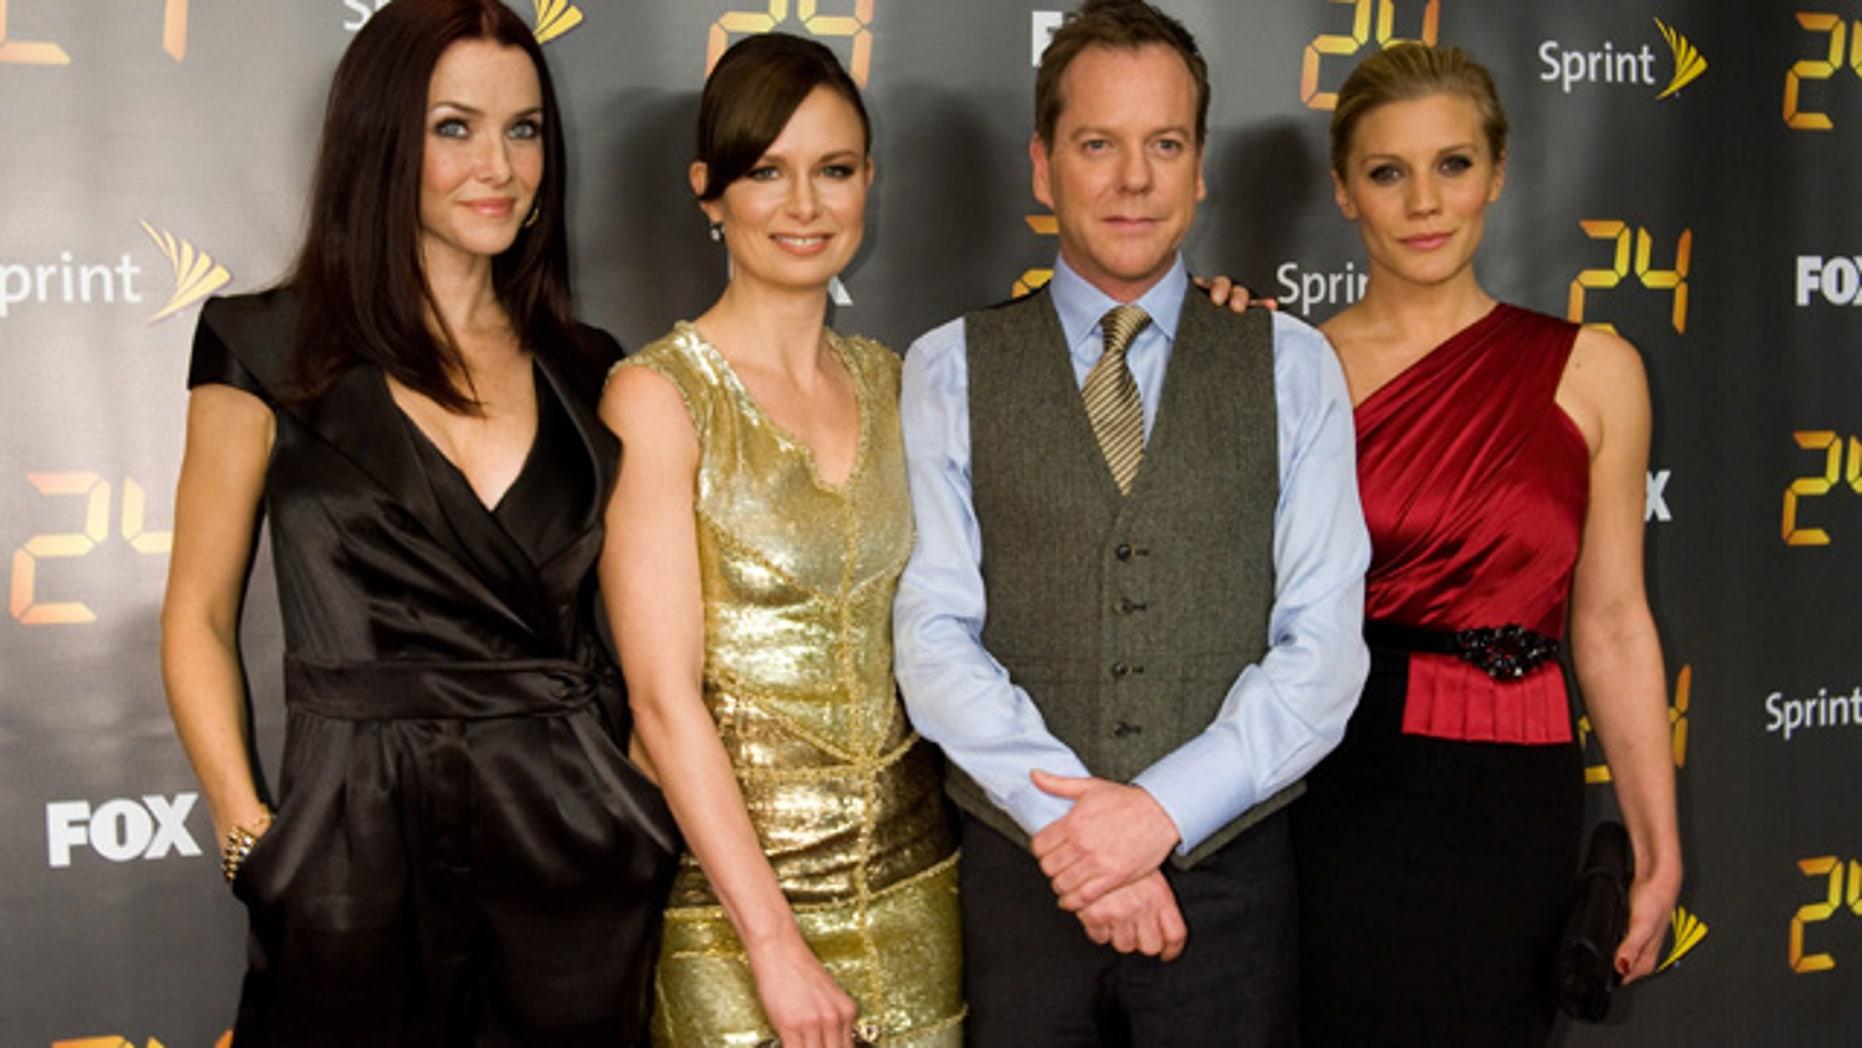 '24' cast members Annie Wersching, Mary Lynn Rajskub, Kiefer Sutherland and Katee Sackhoff.